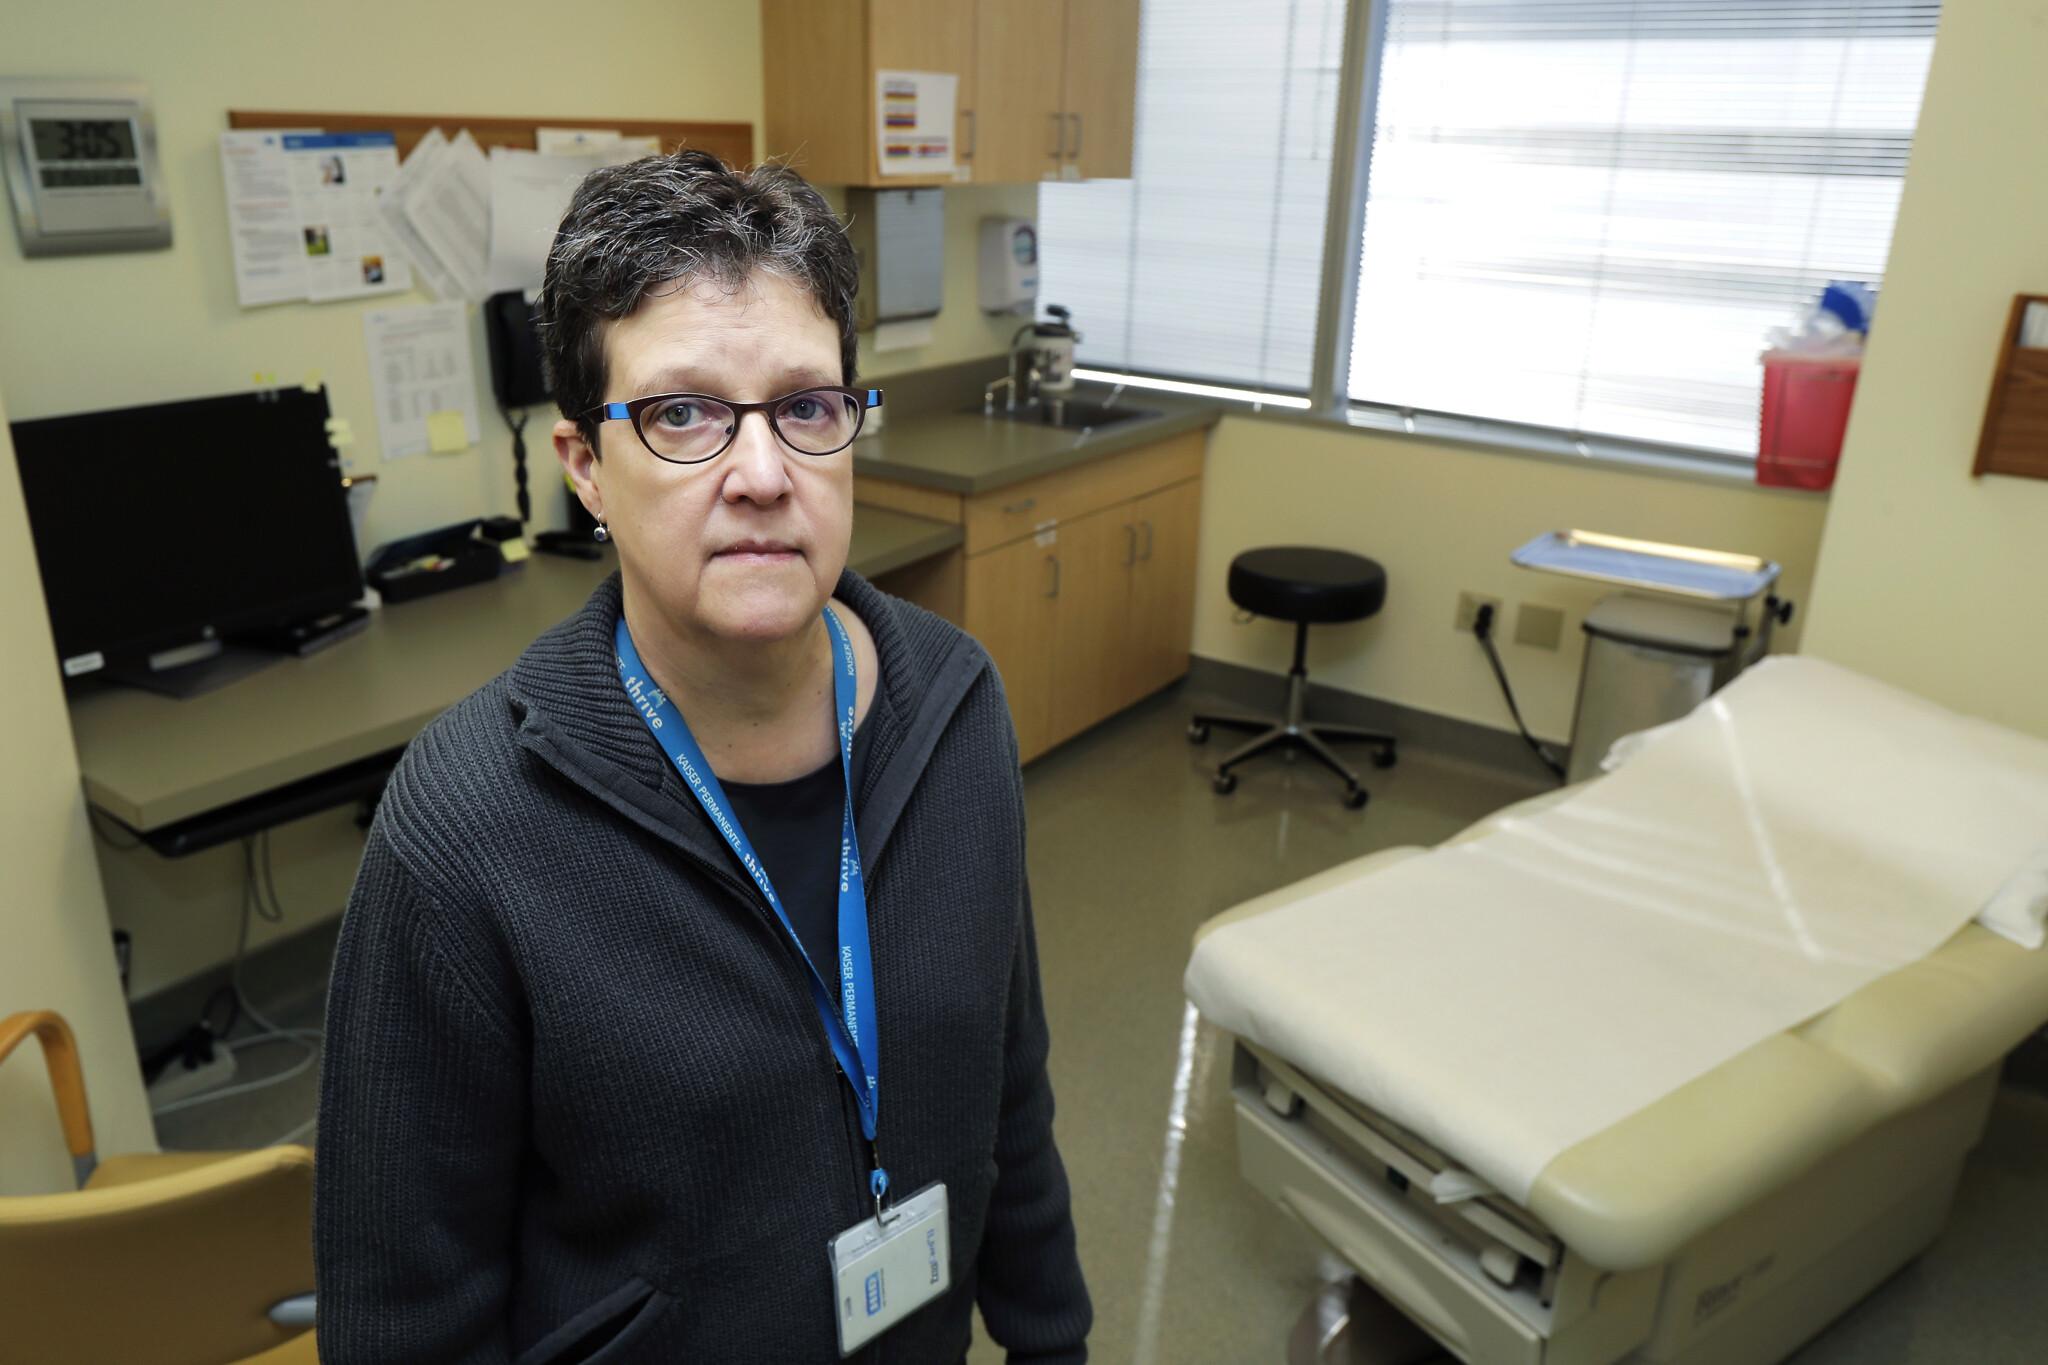 Coronavirus vaccine test opens as US volunteer gets 1st shot | The ...